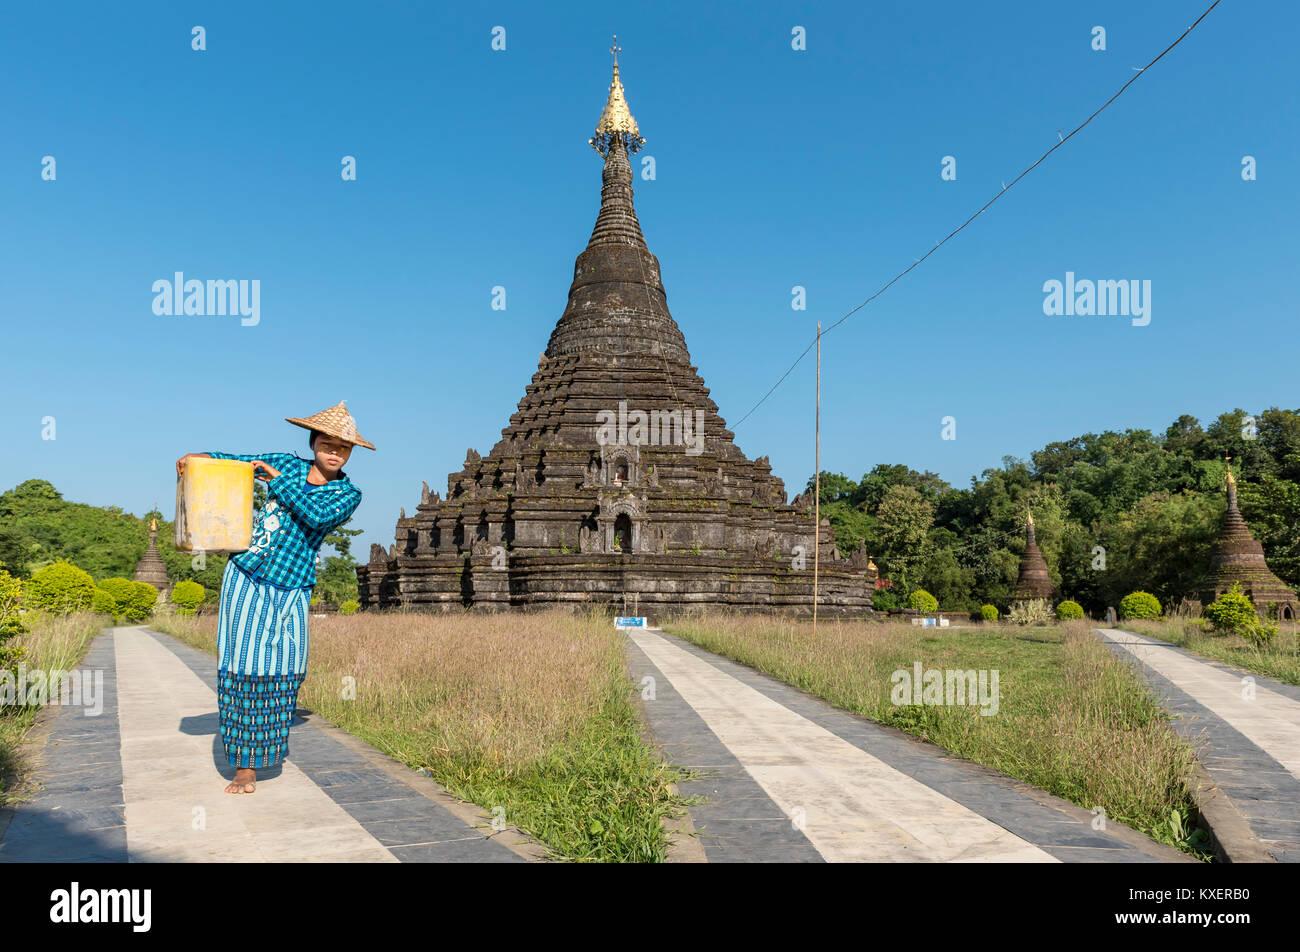 Woman worker at Sakya Man Aung Pagoda,Sakyamanaung Paya,Mrauk U,Burma,Myanmar - Stock Image